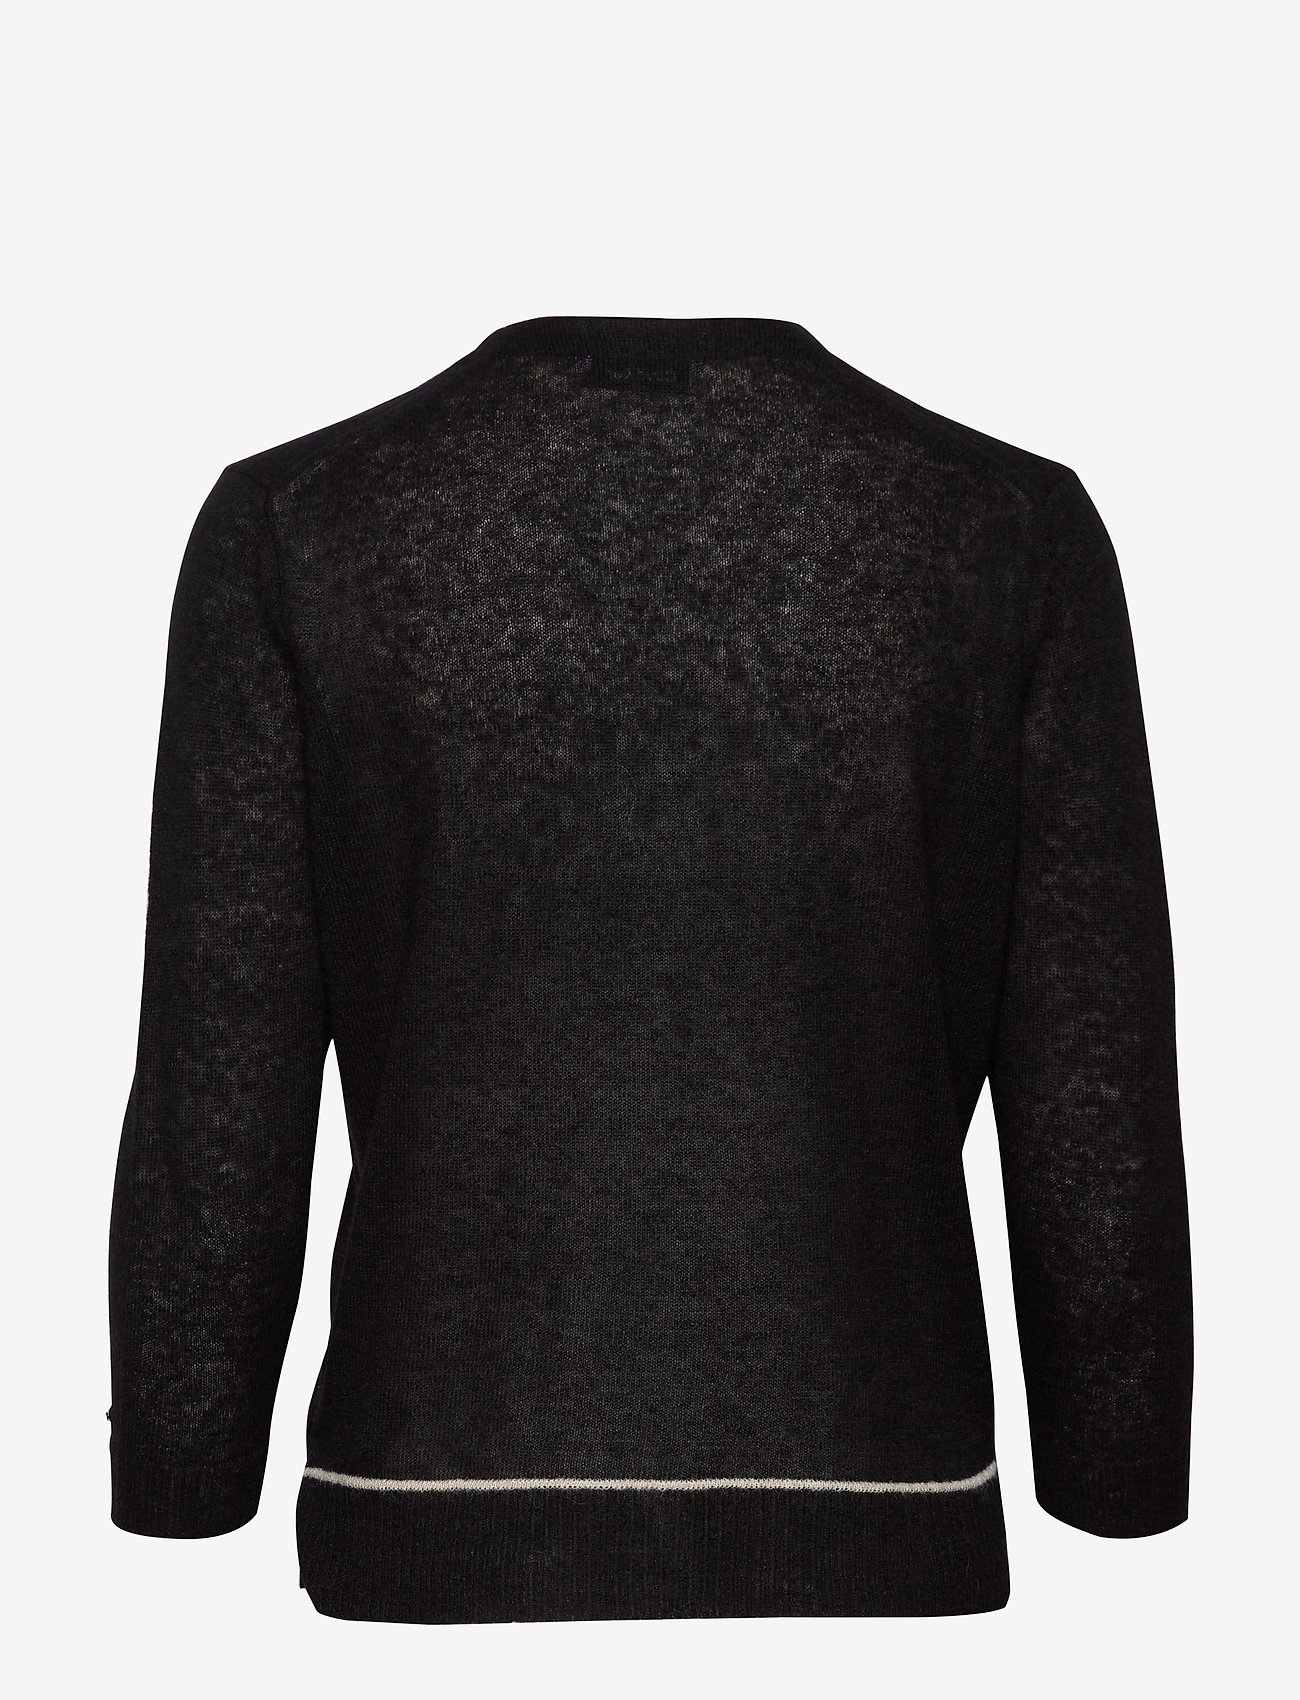 3/4 Sleeve Alpaca Blend Cardigan (Ck Black) (1400 kr) - Calvin Klein